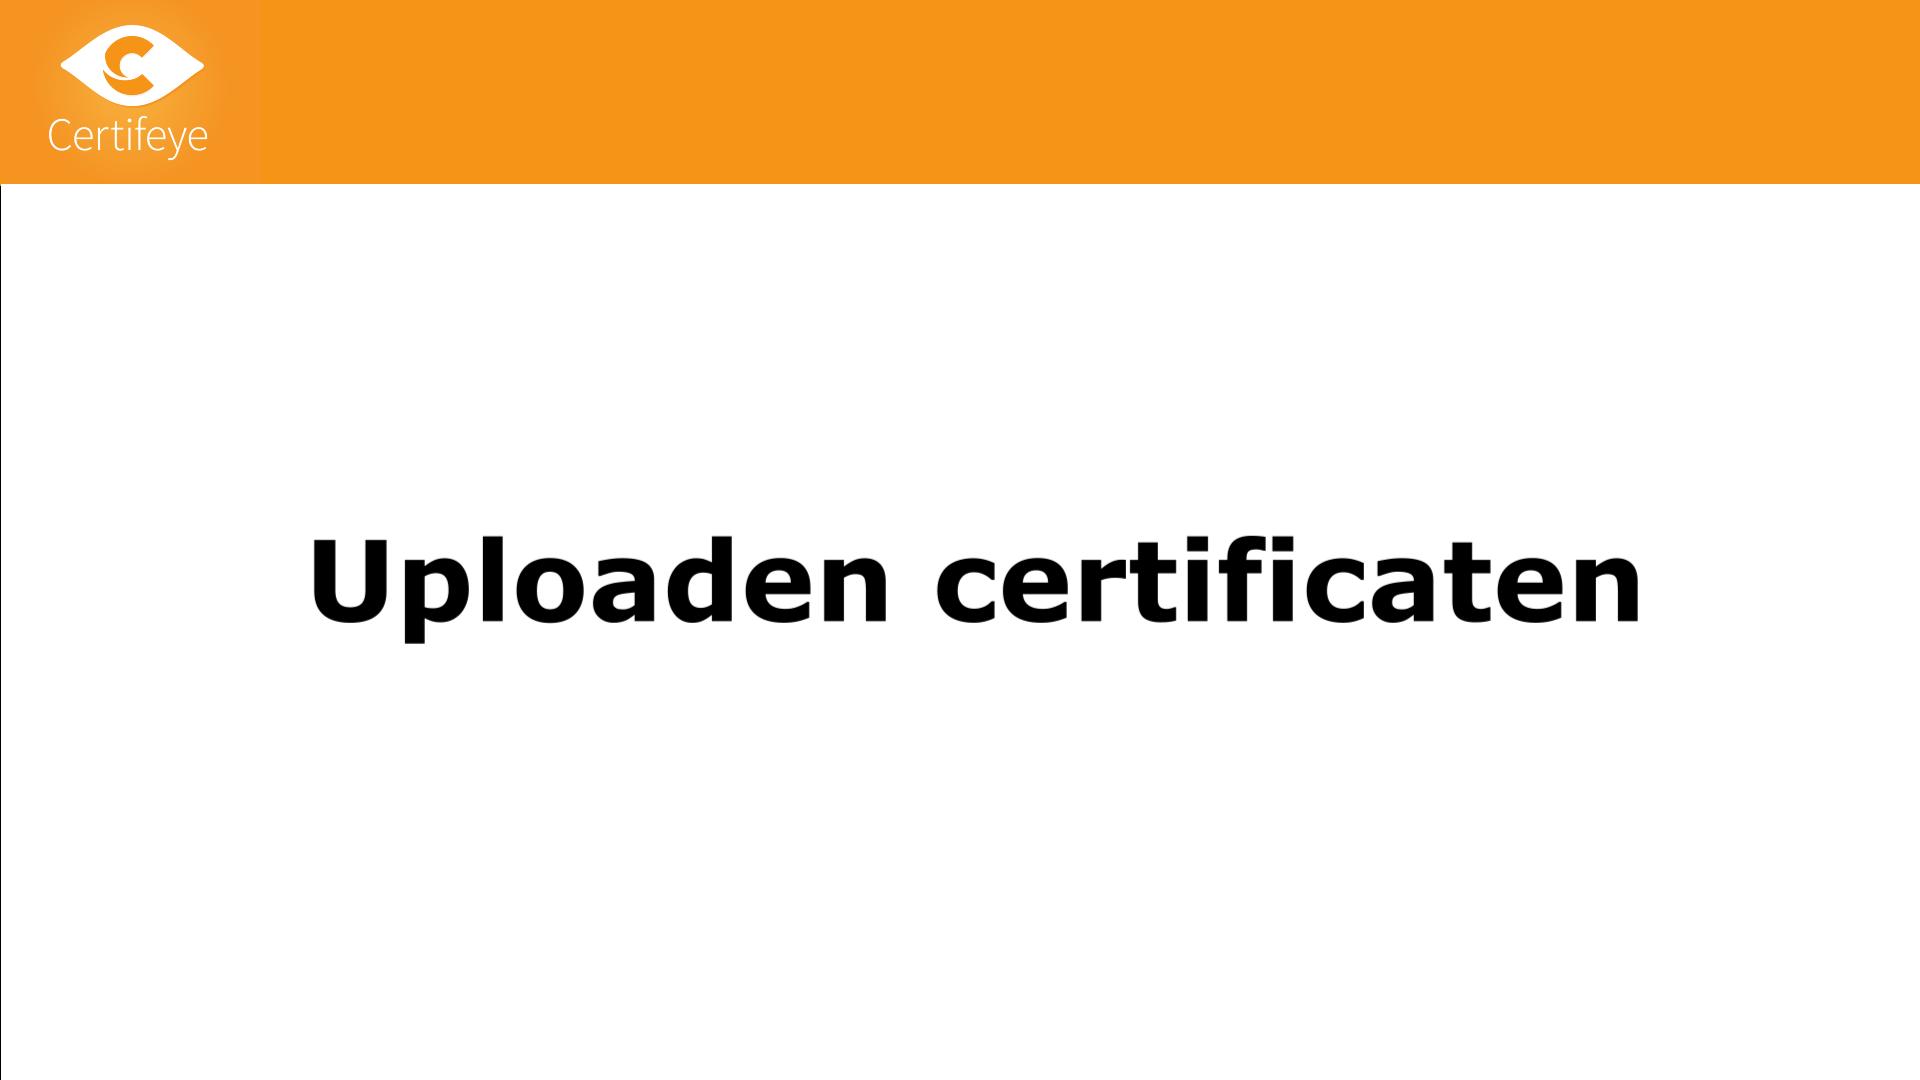 Certifeye Wallet – Uploaden certificaten